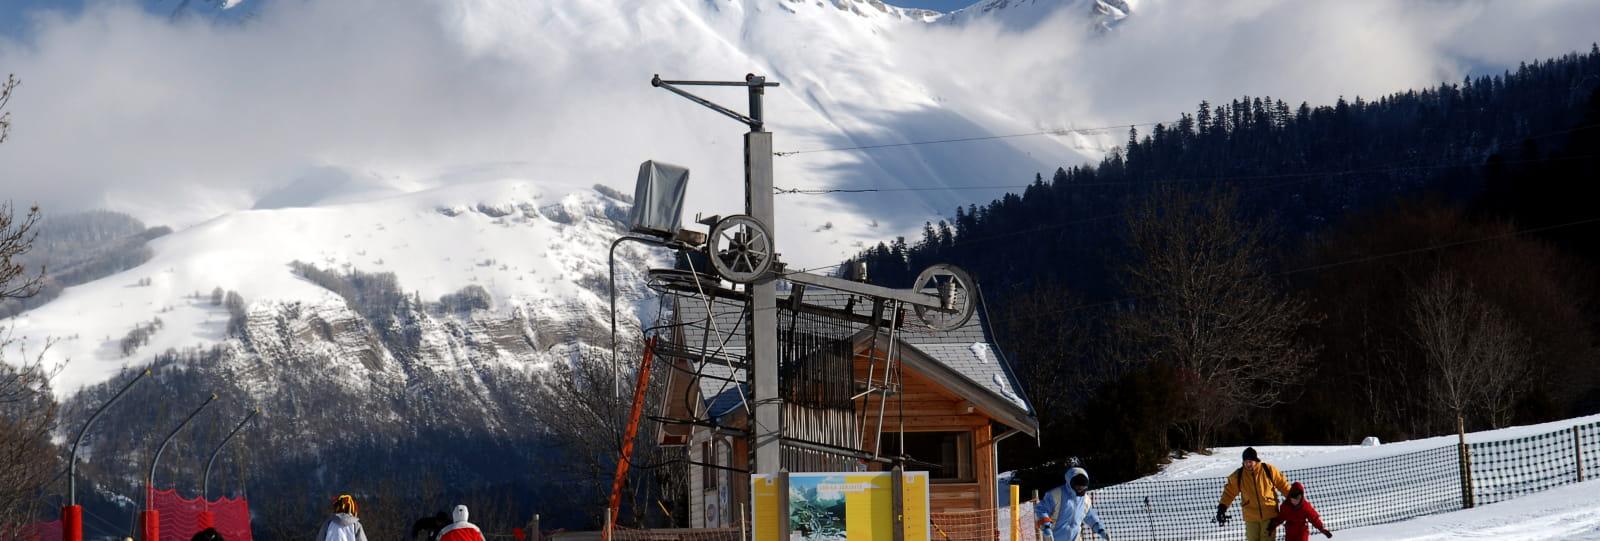 pied des pistes de ski alpin